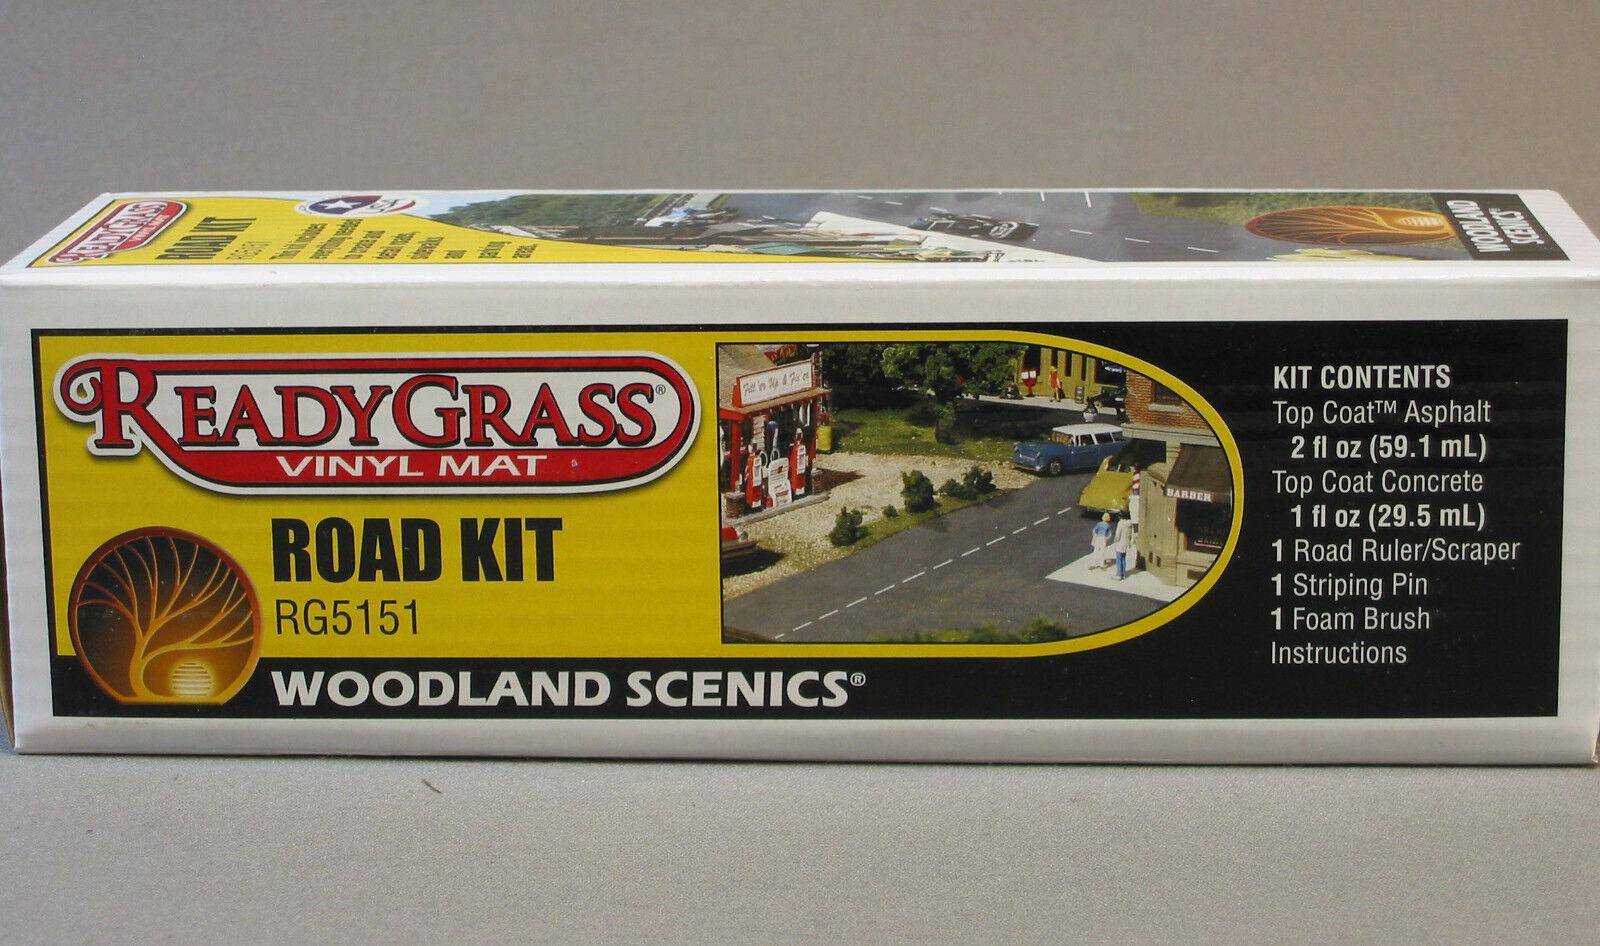 Woodland Scenics Road Kit RG5151